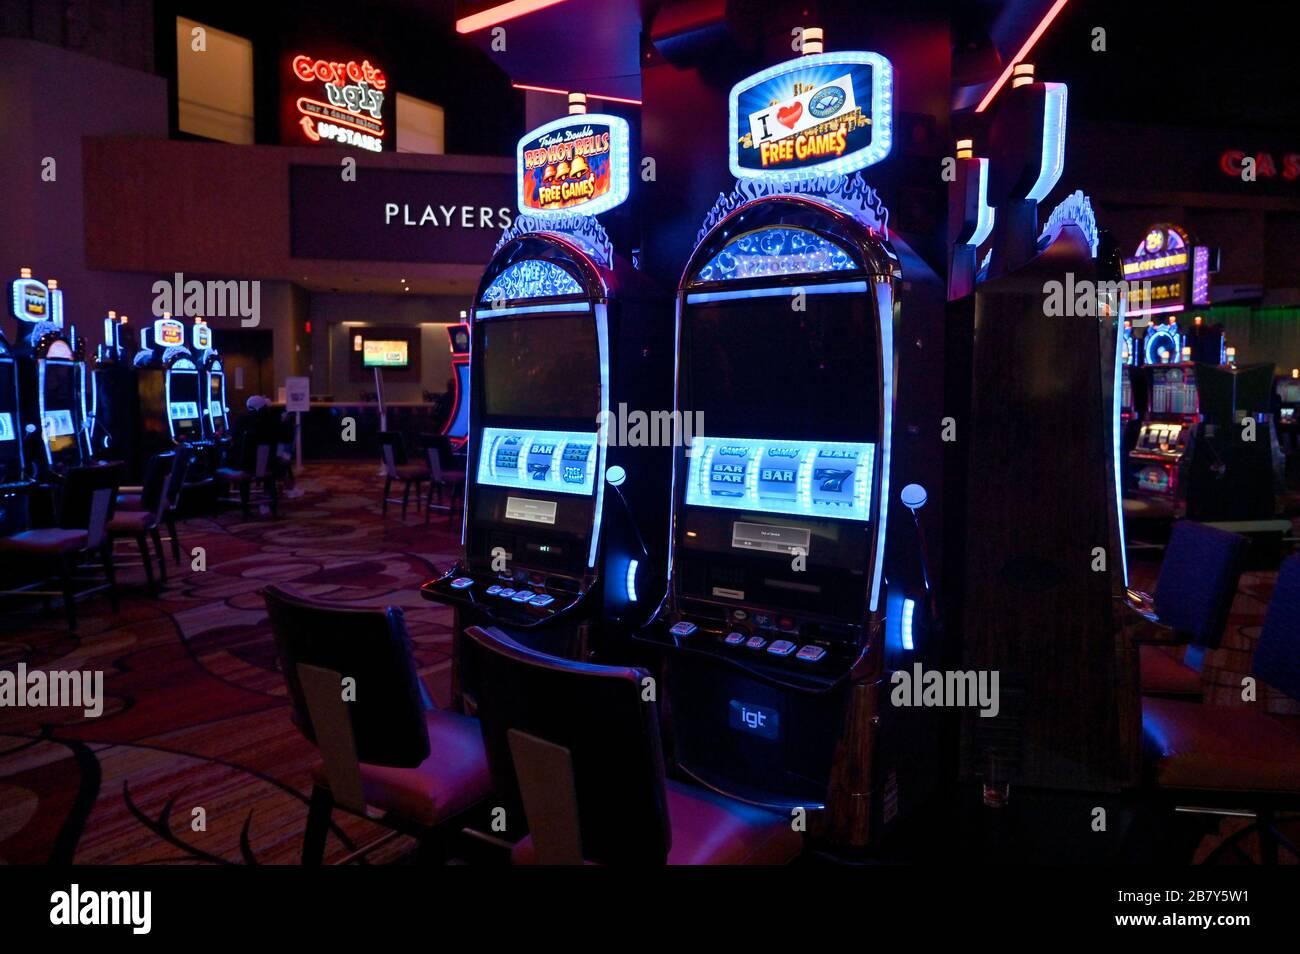 Blackjack kasino warkop meninggal dunia bulan